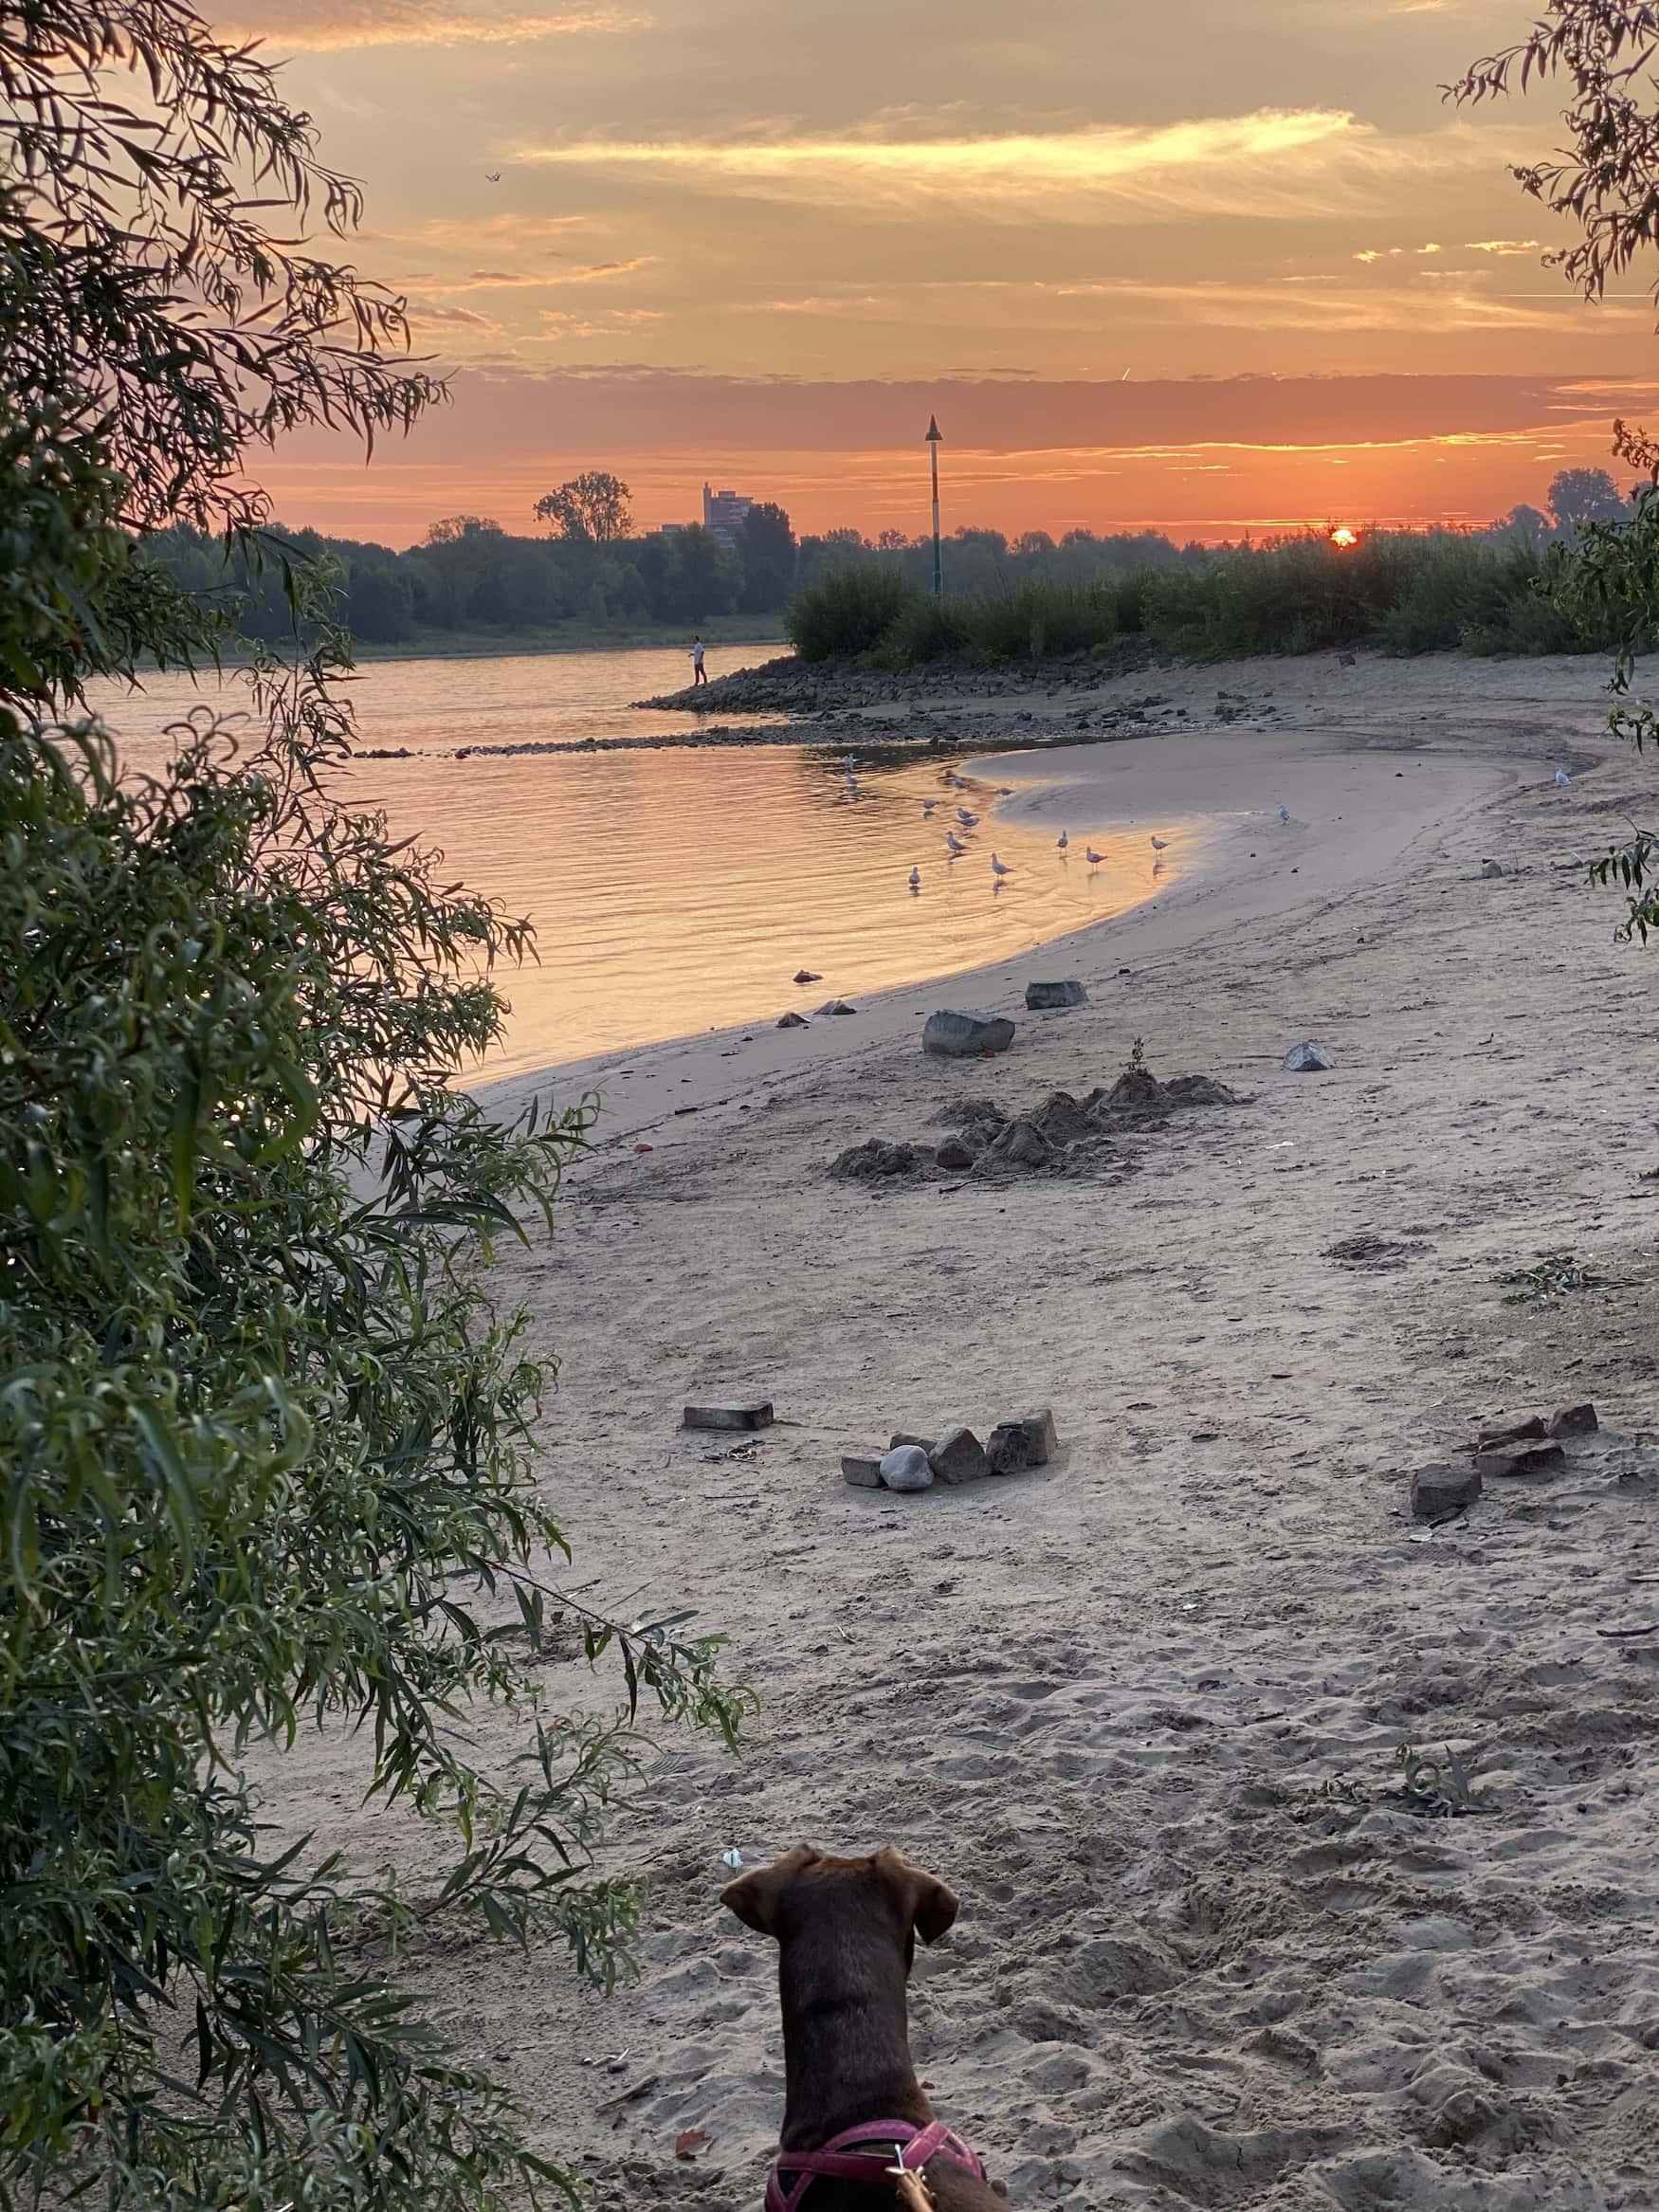 Hund schaut den Sonnenuntergang am Rhein in Köln Rodenkirchen